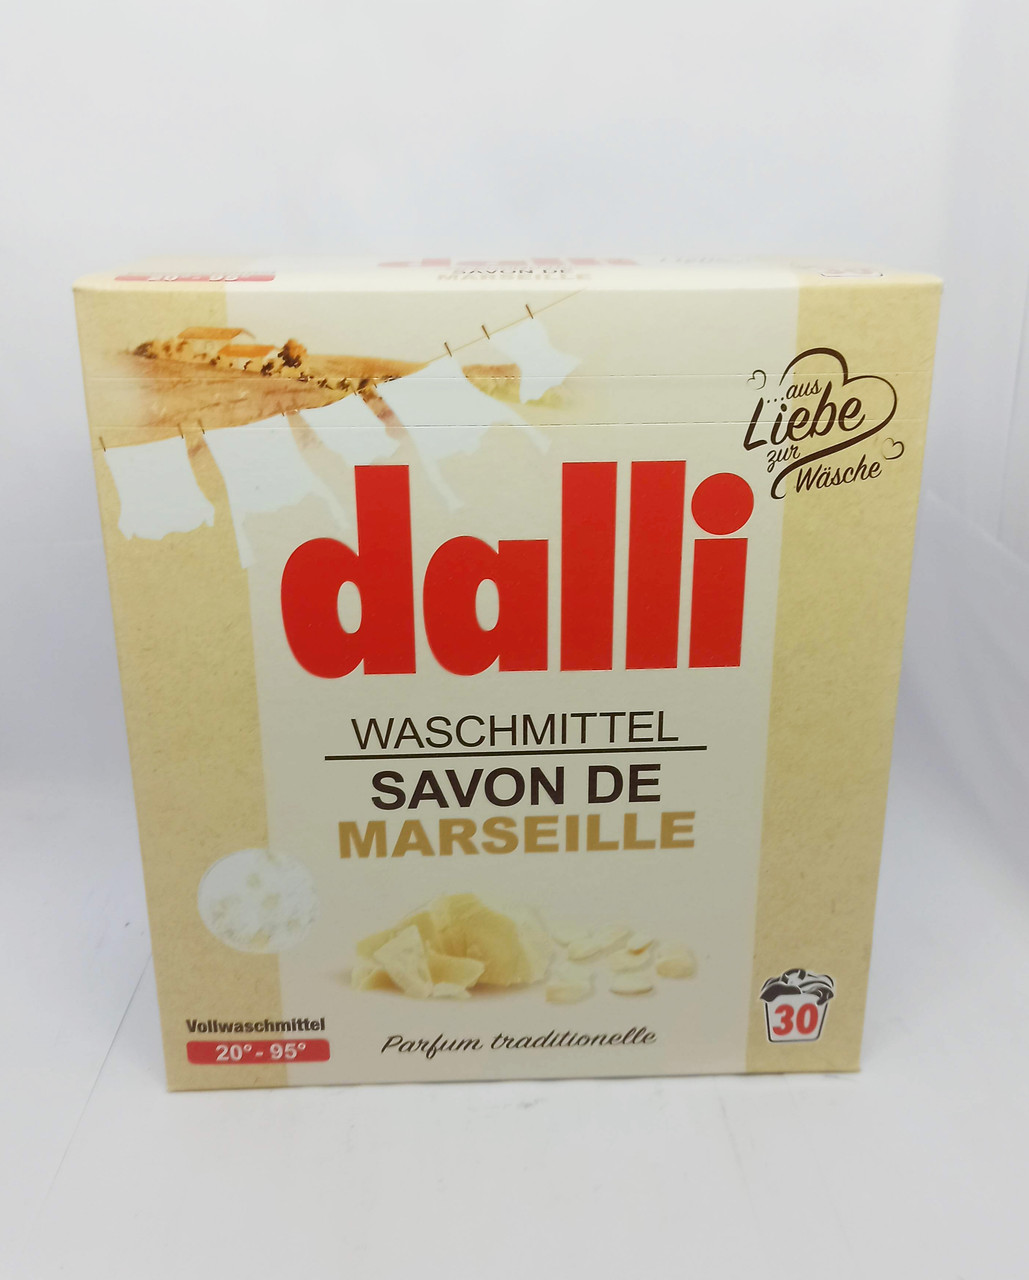 Порошок для прання Dalli Waschmittel Savon De Marseille зі стружкою марсельського мила, 1.95 кг (30 прань)